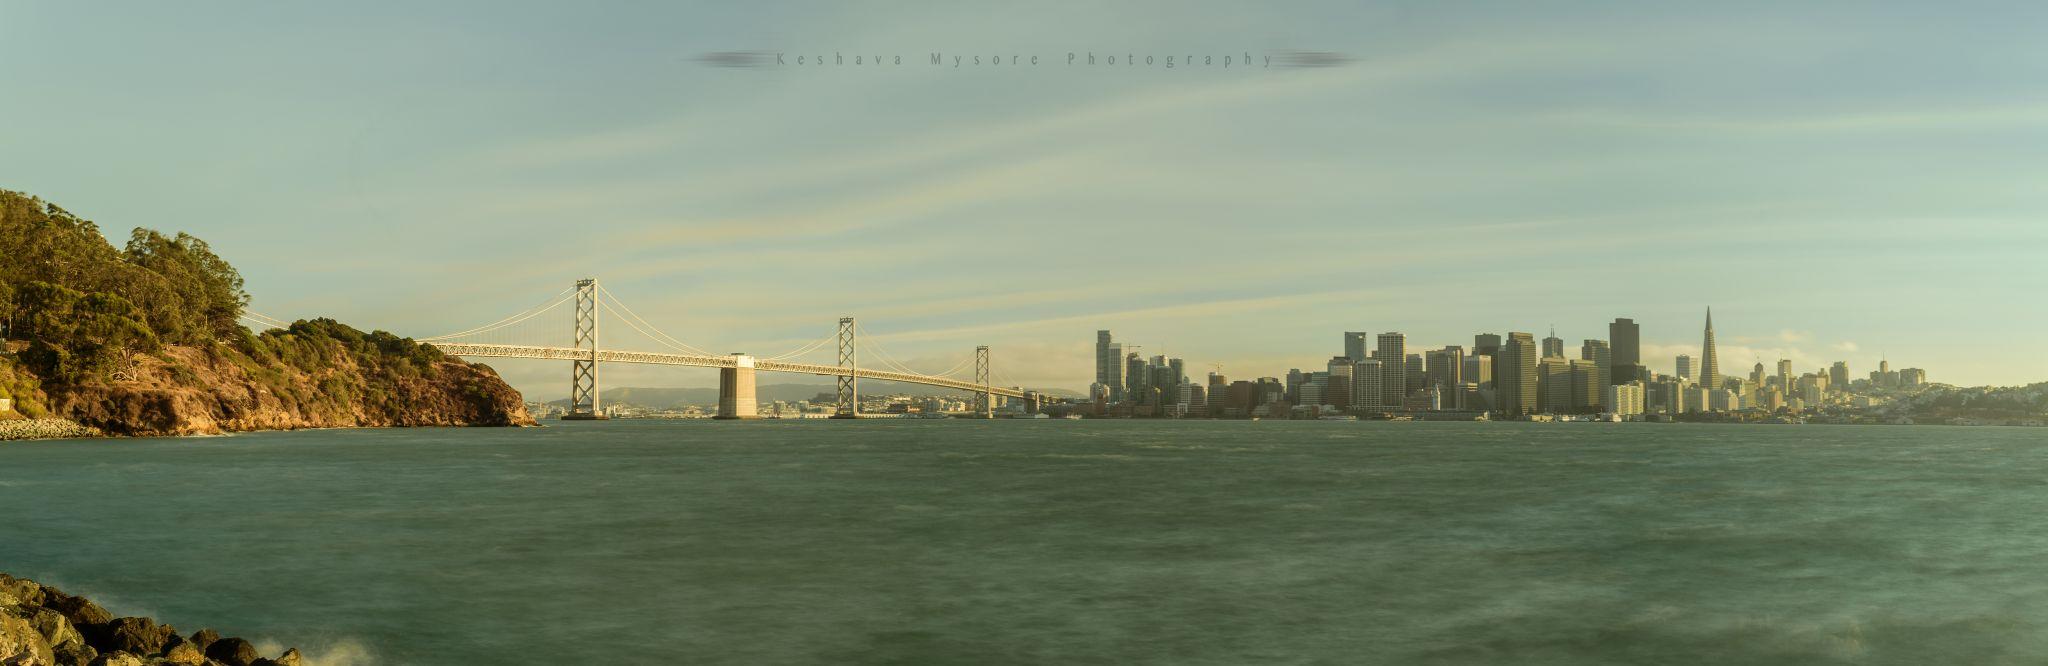 SFO skyline from Treasure Island, USA